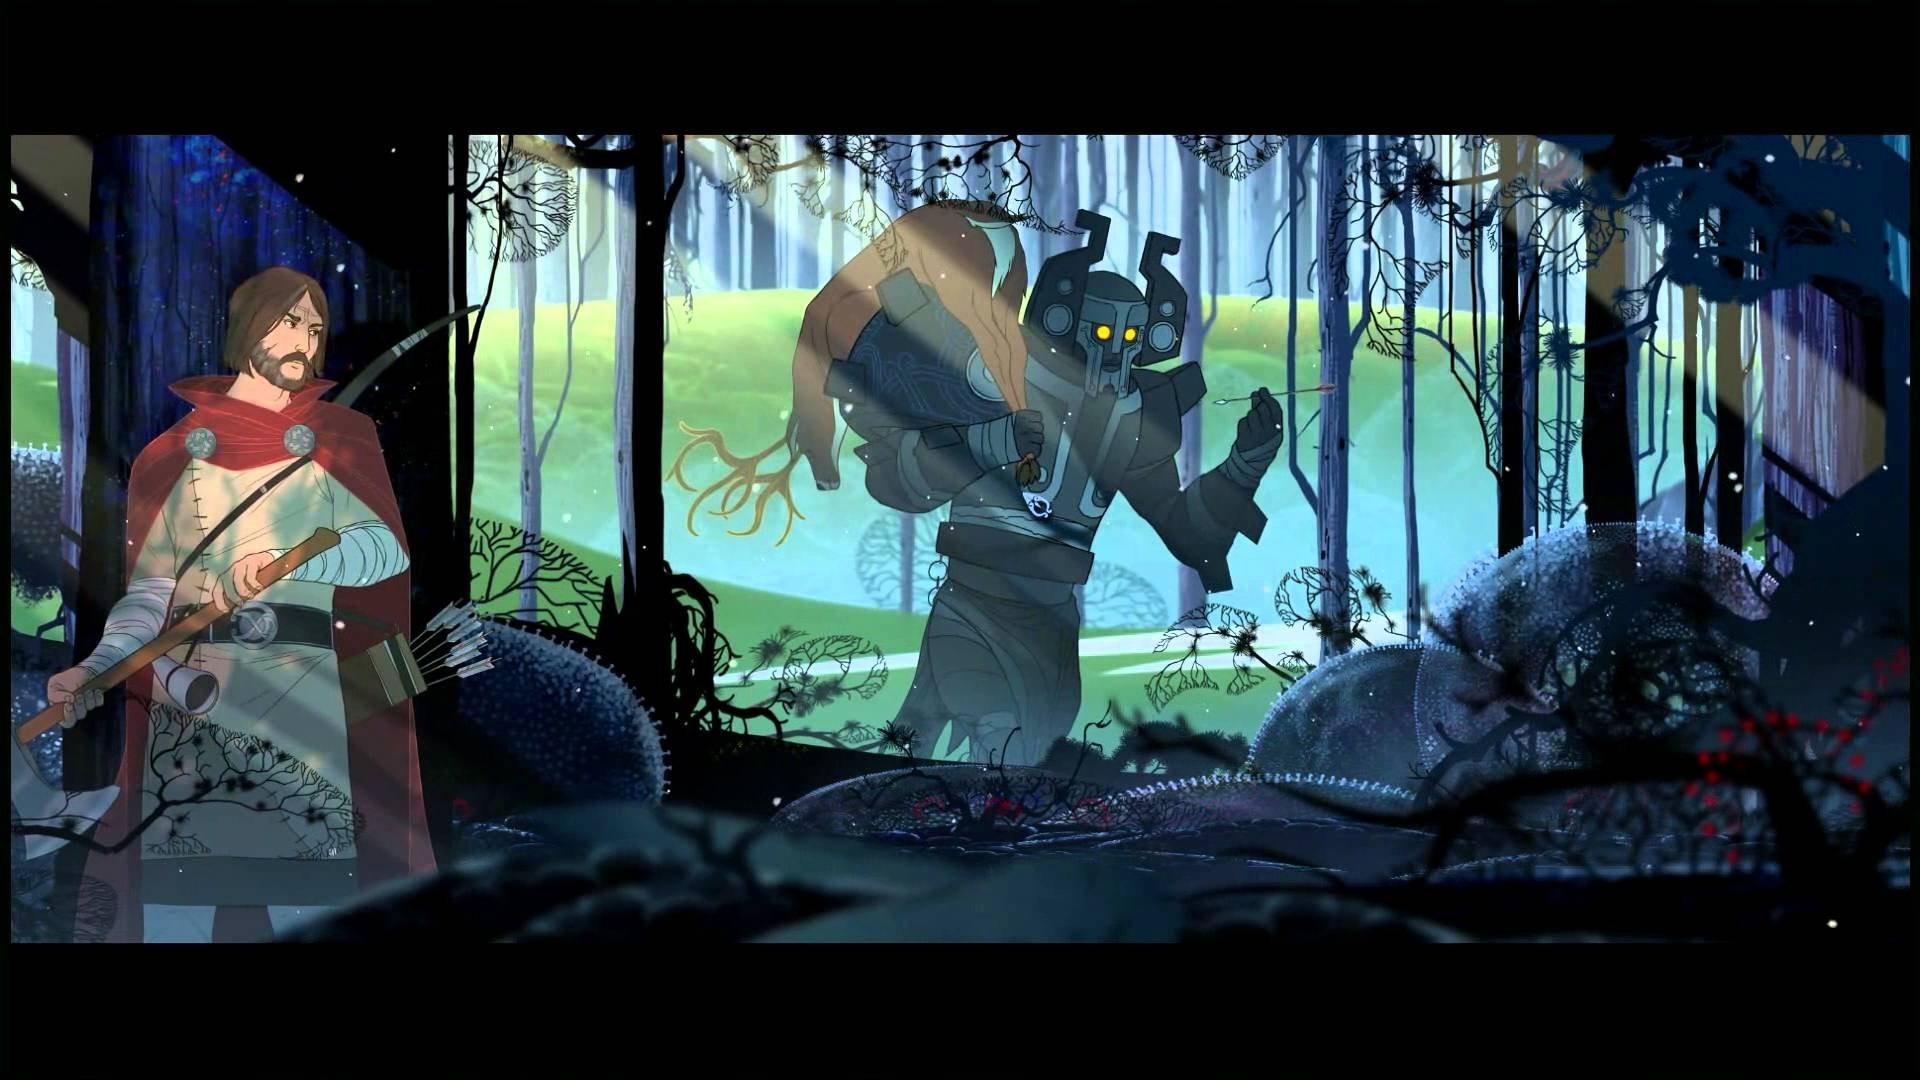 BANNER SAGA adventure fantasy tactical rpg viking fighting strategy 1bsaga warrior  wallpaper     635949   WallpaperUP